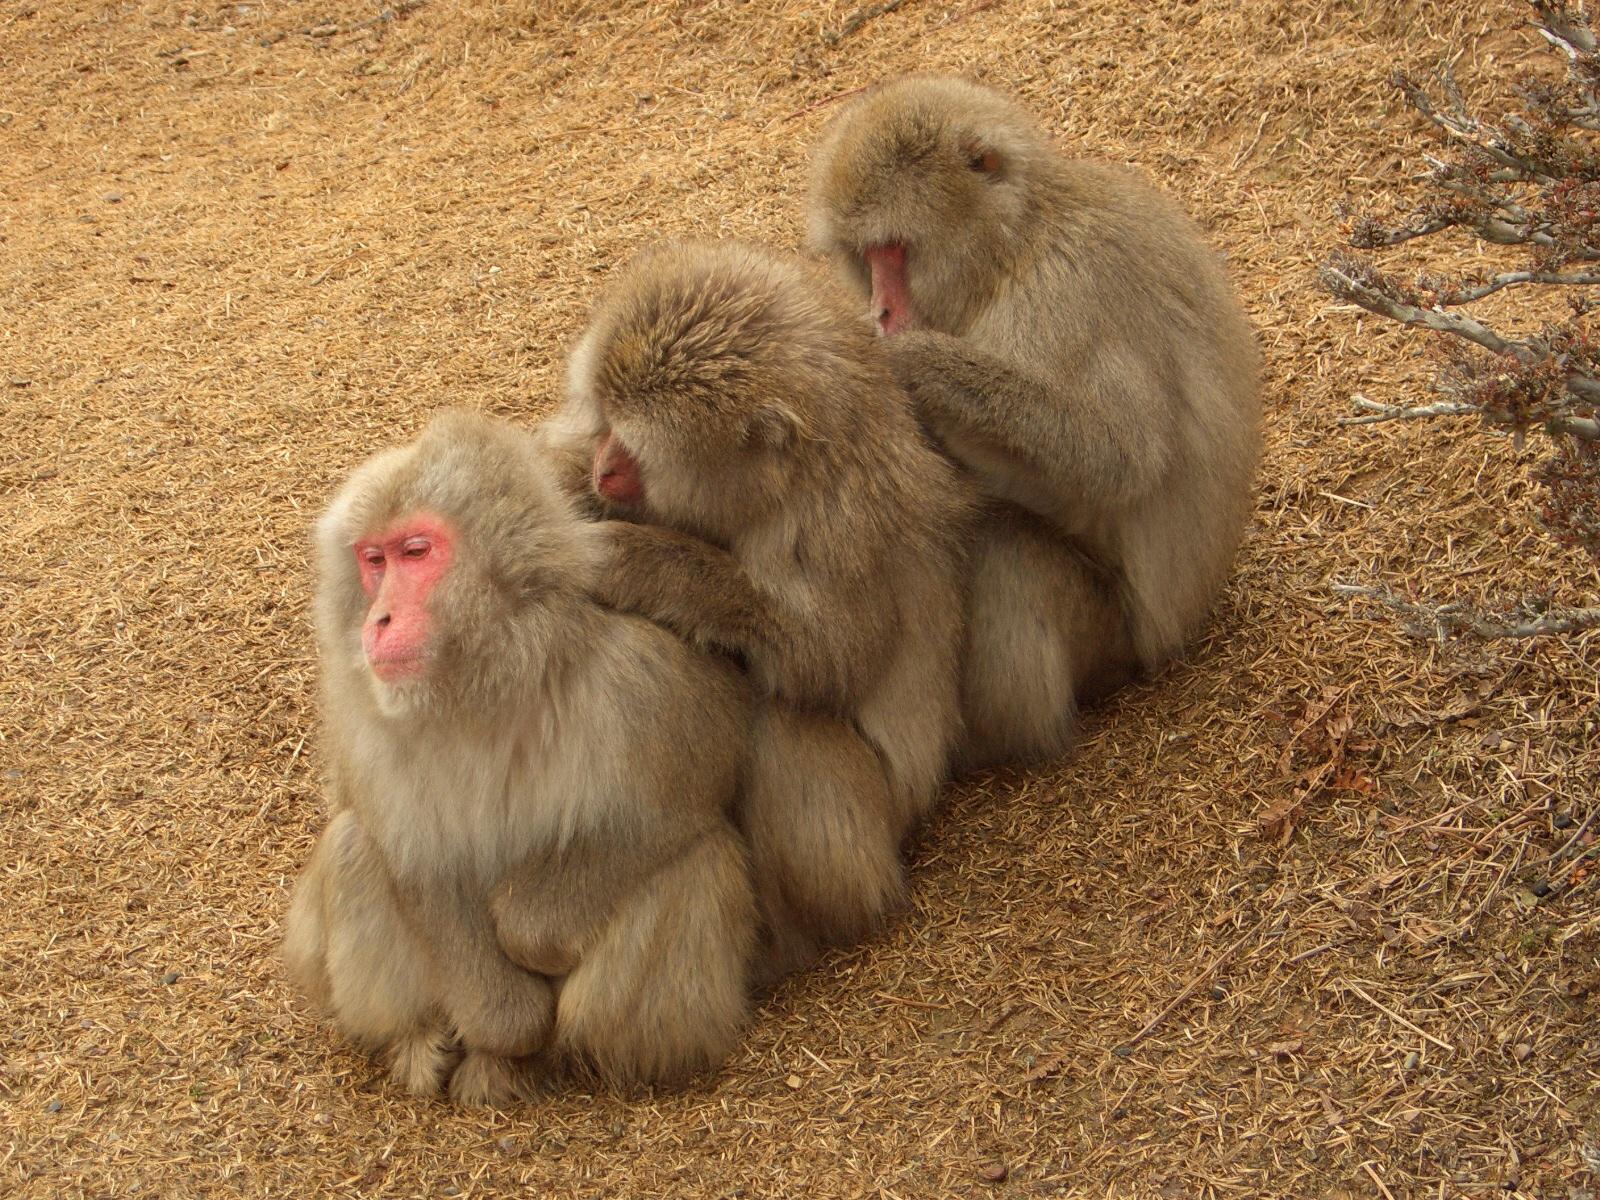 Japanese macaques predators predators sex offenders